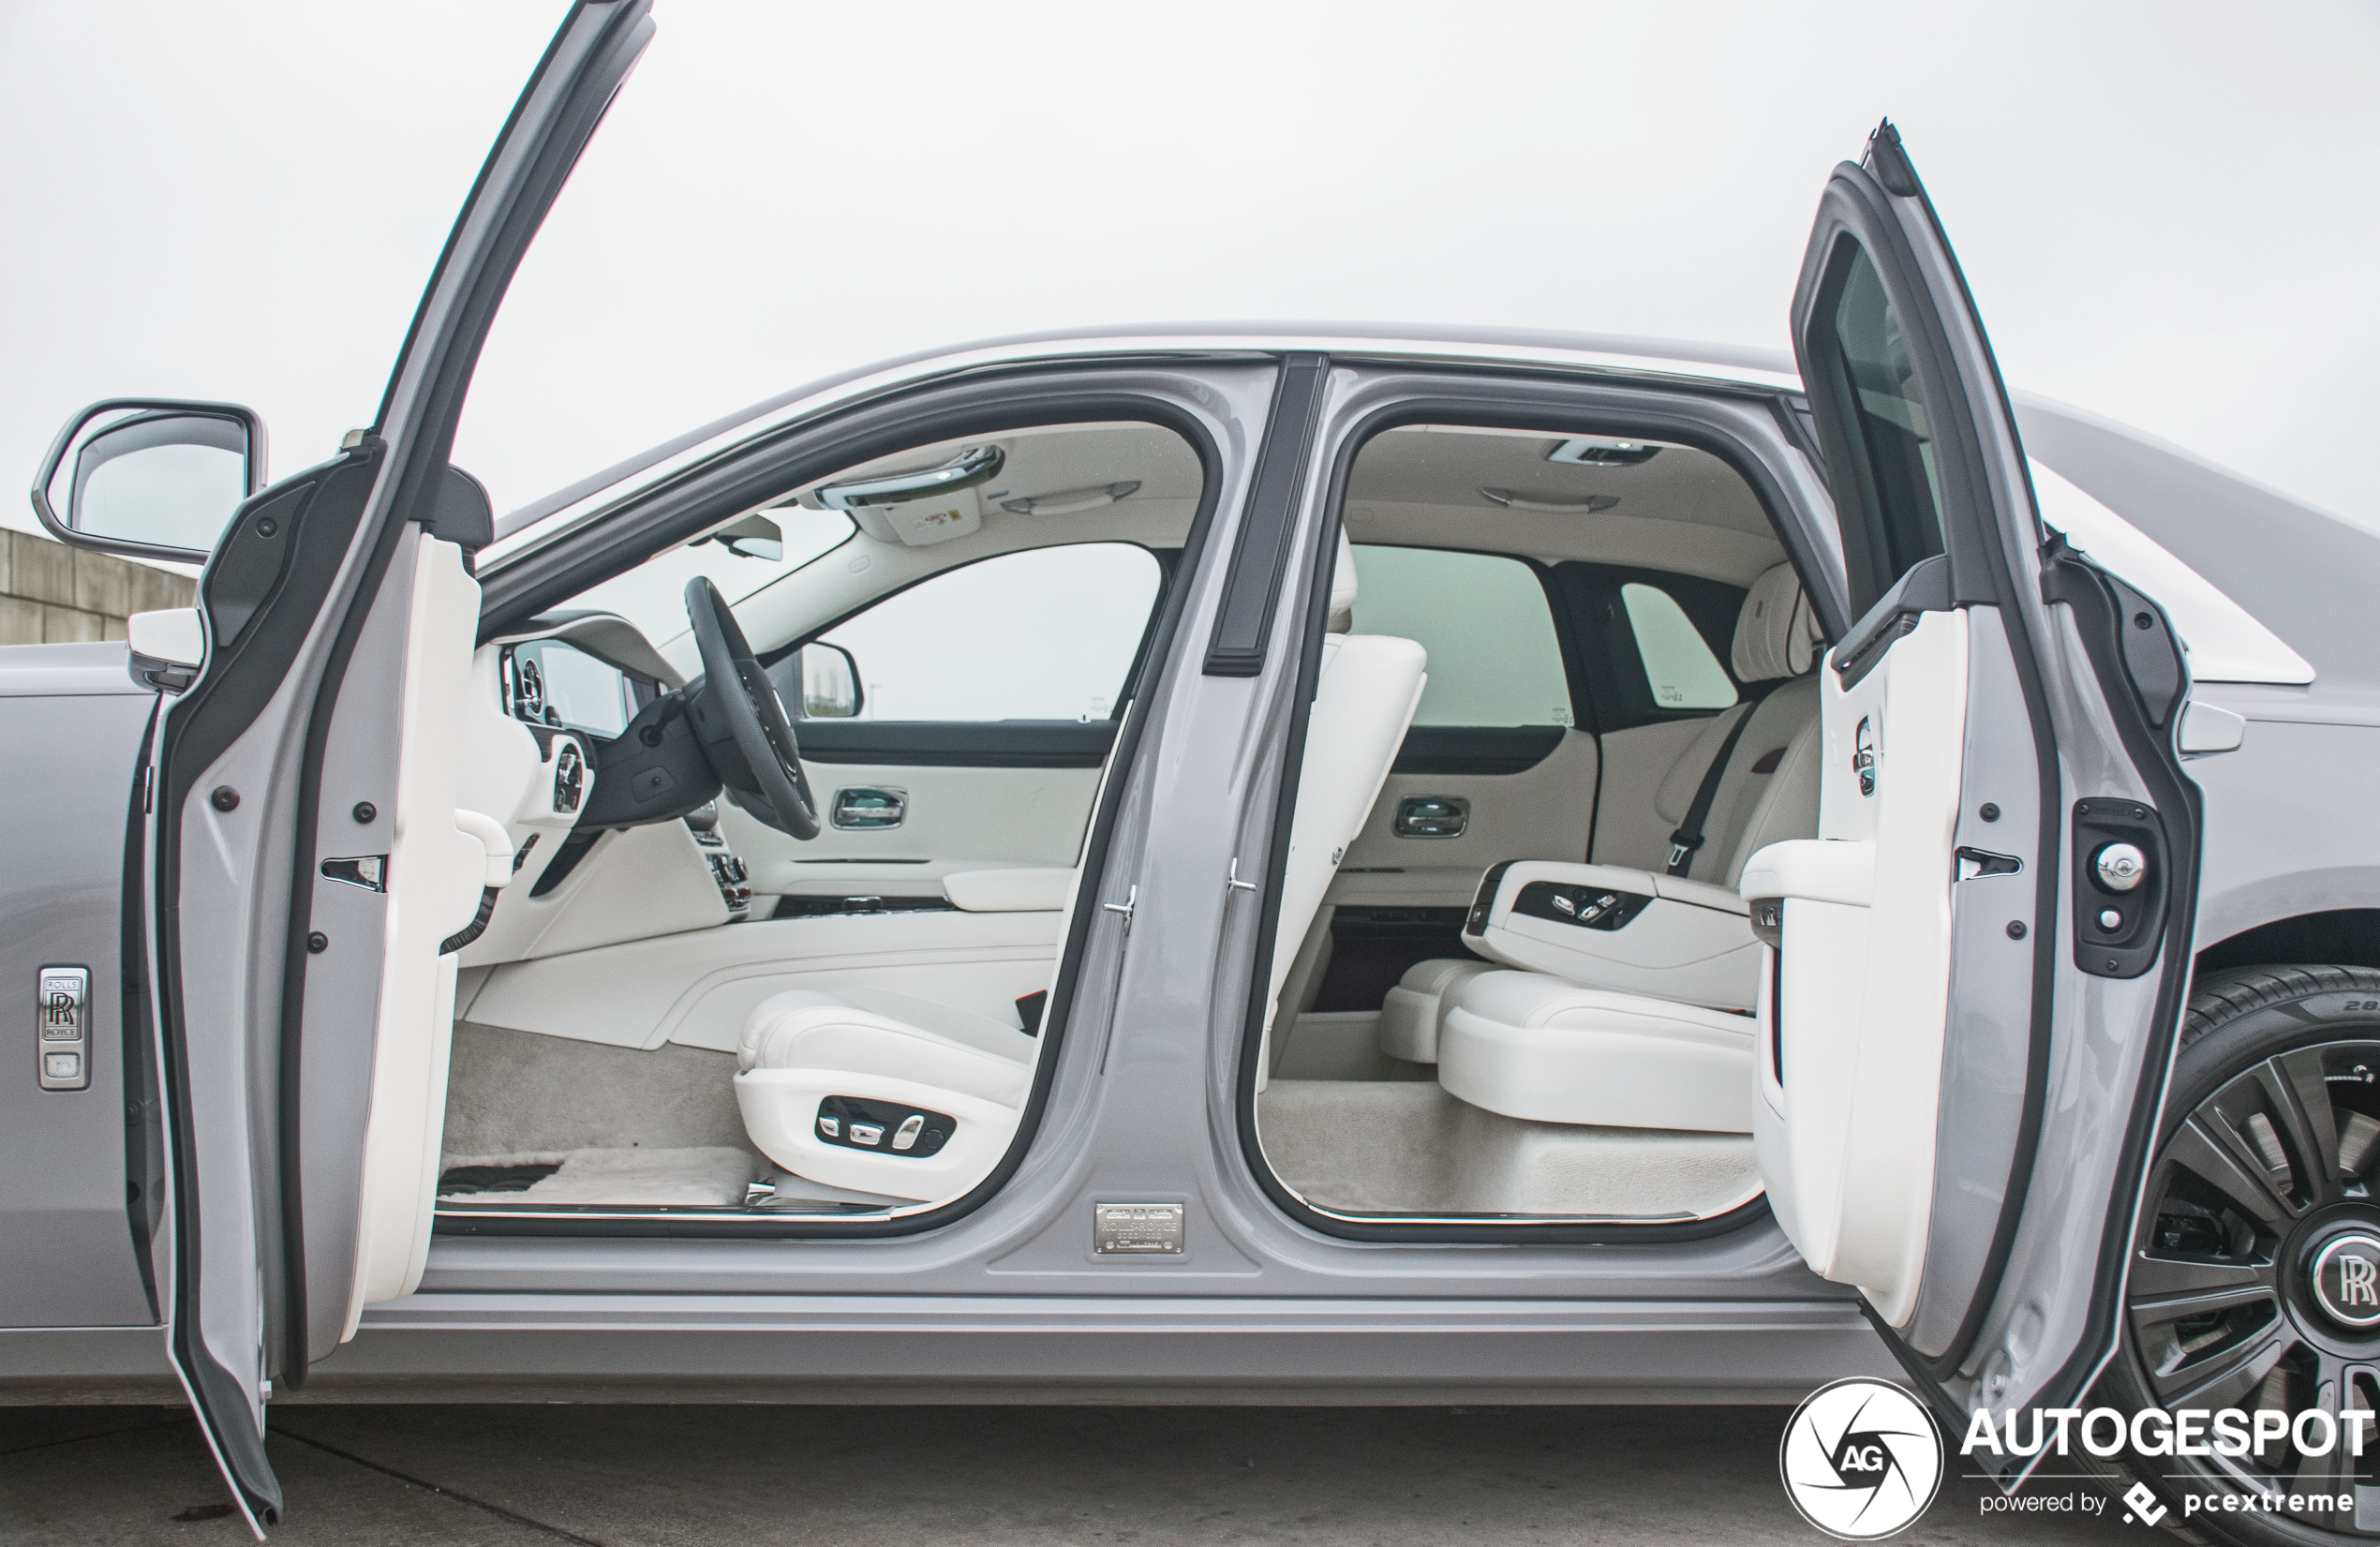 A look inside the new Rolls-Royce Ghost